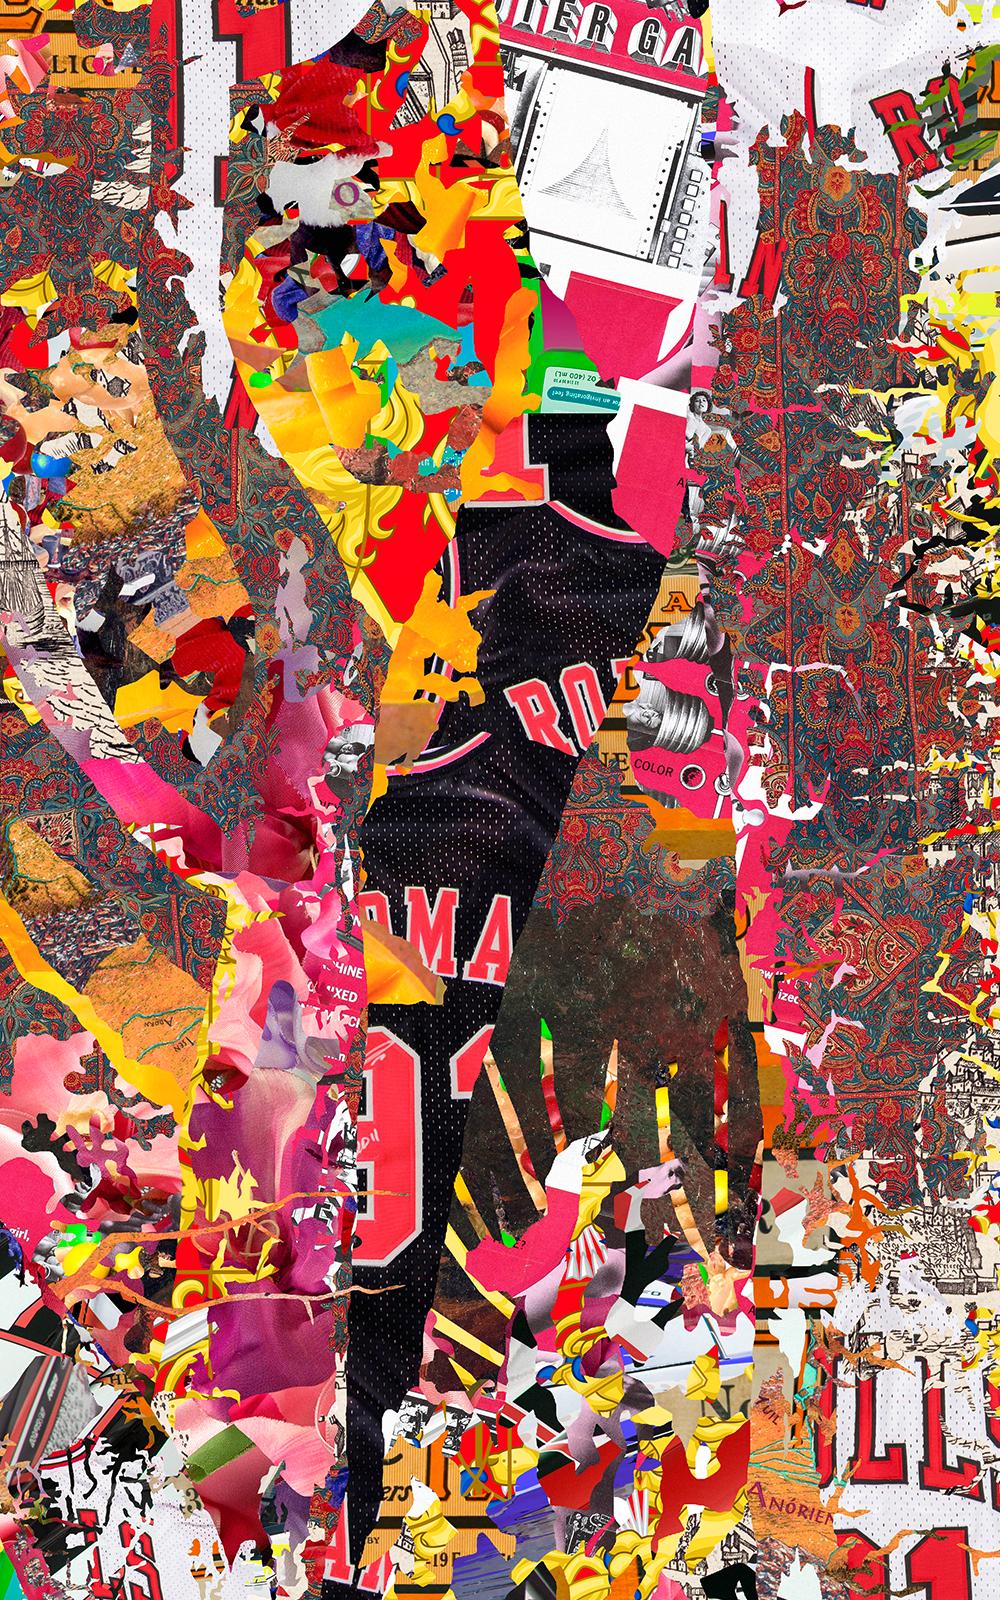 Case Simmons, Simmons & Burke, Cherry Bomb, Dutchmasters, Kohn Gallery,Pigment Print, Digital Collage,Digital Art, Photoshop Collage, Contemporary Collage, Photoshop Actions, Case Simmons Art